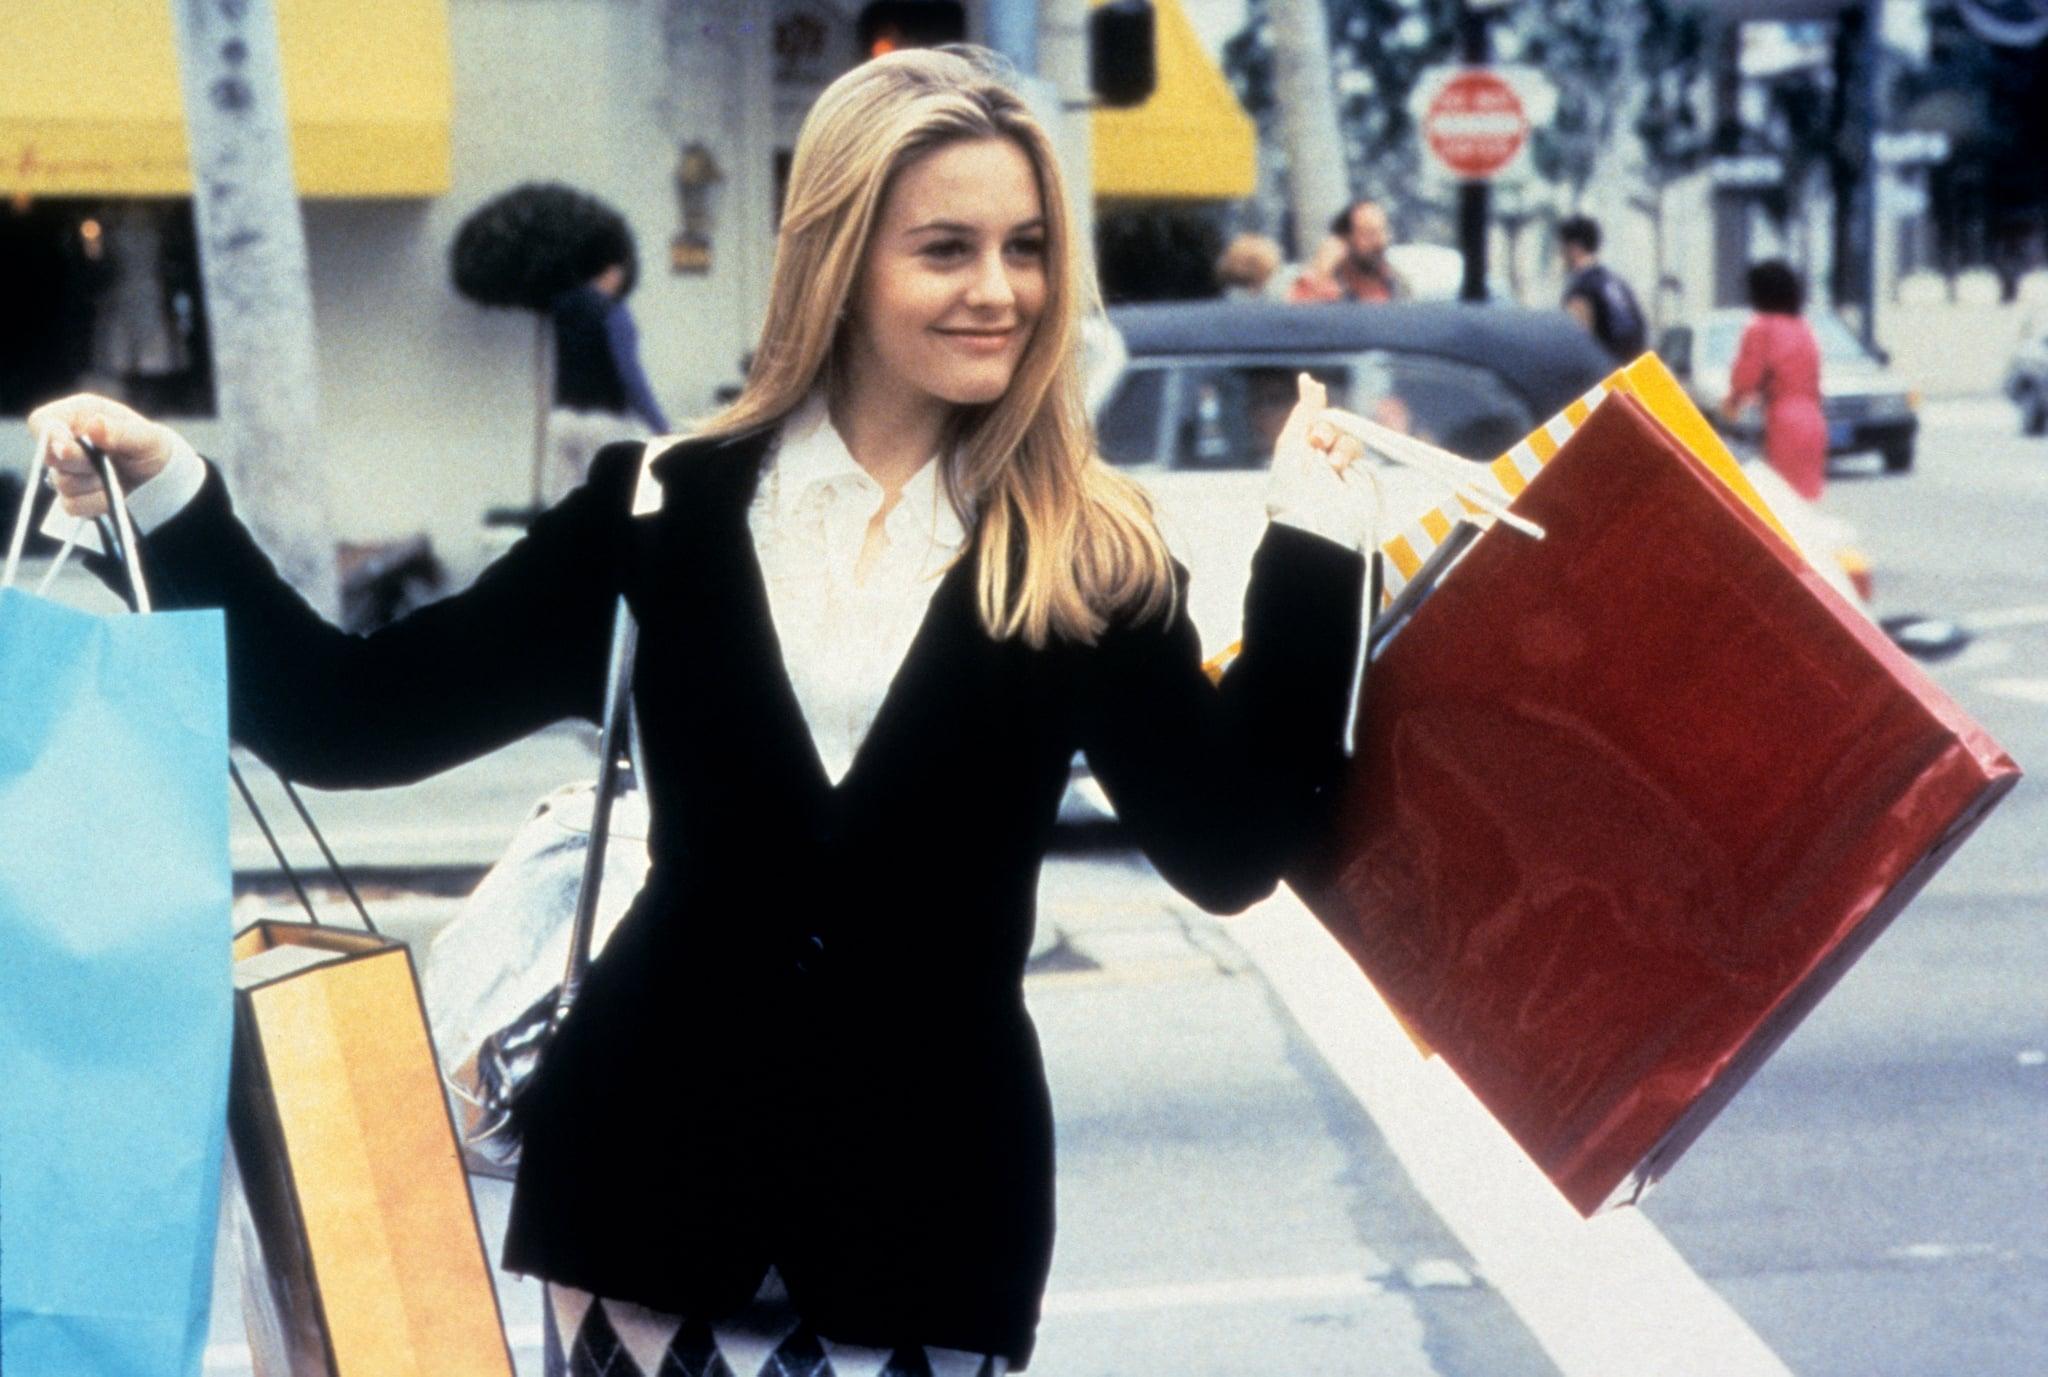 CLUELESS, Alicia Silverstone, 1995.  Paramount/ Courtesy:  Everett Collection